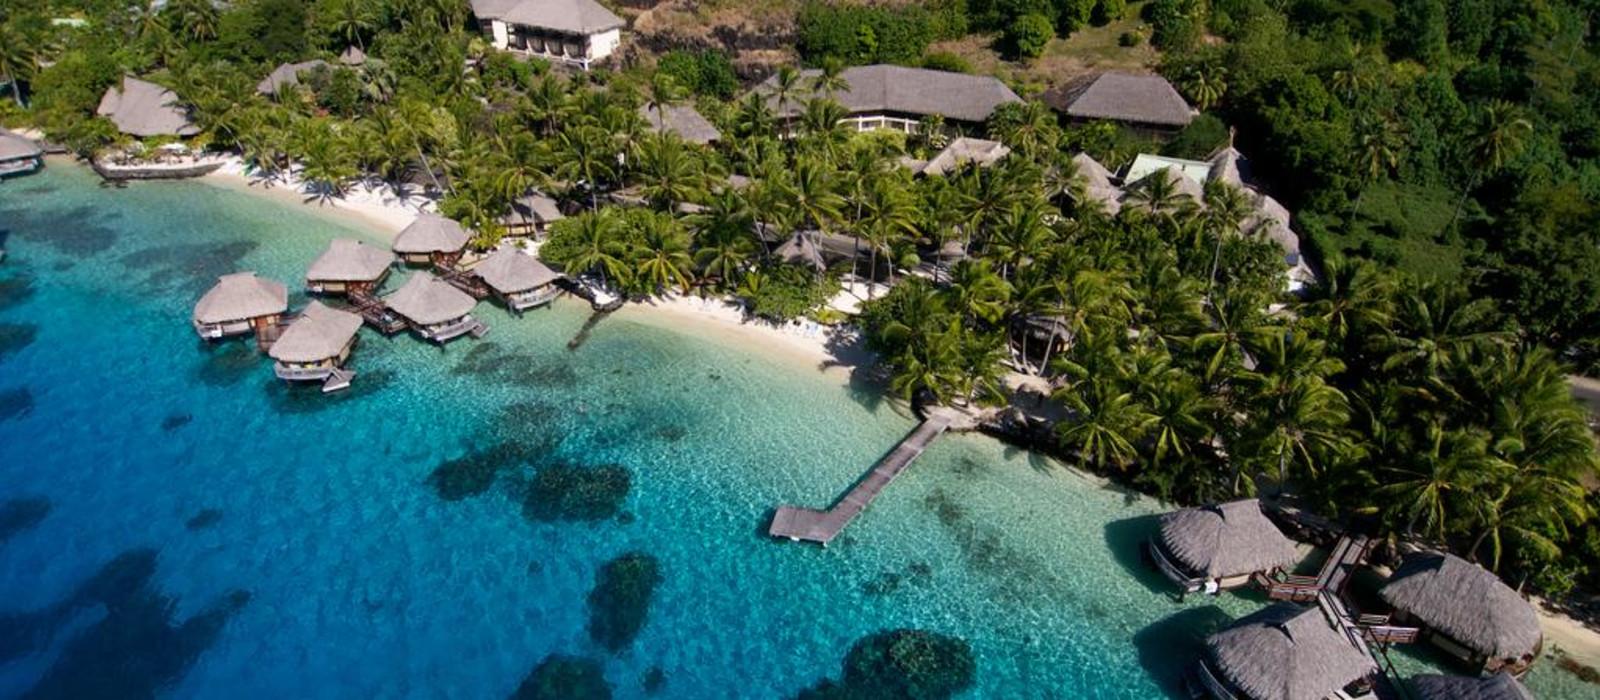 Hotel Le Maitai Polynesia Bora Bora Französisch Polynesien